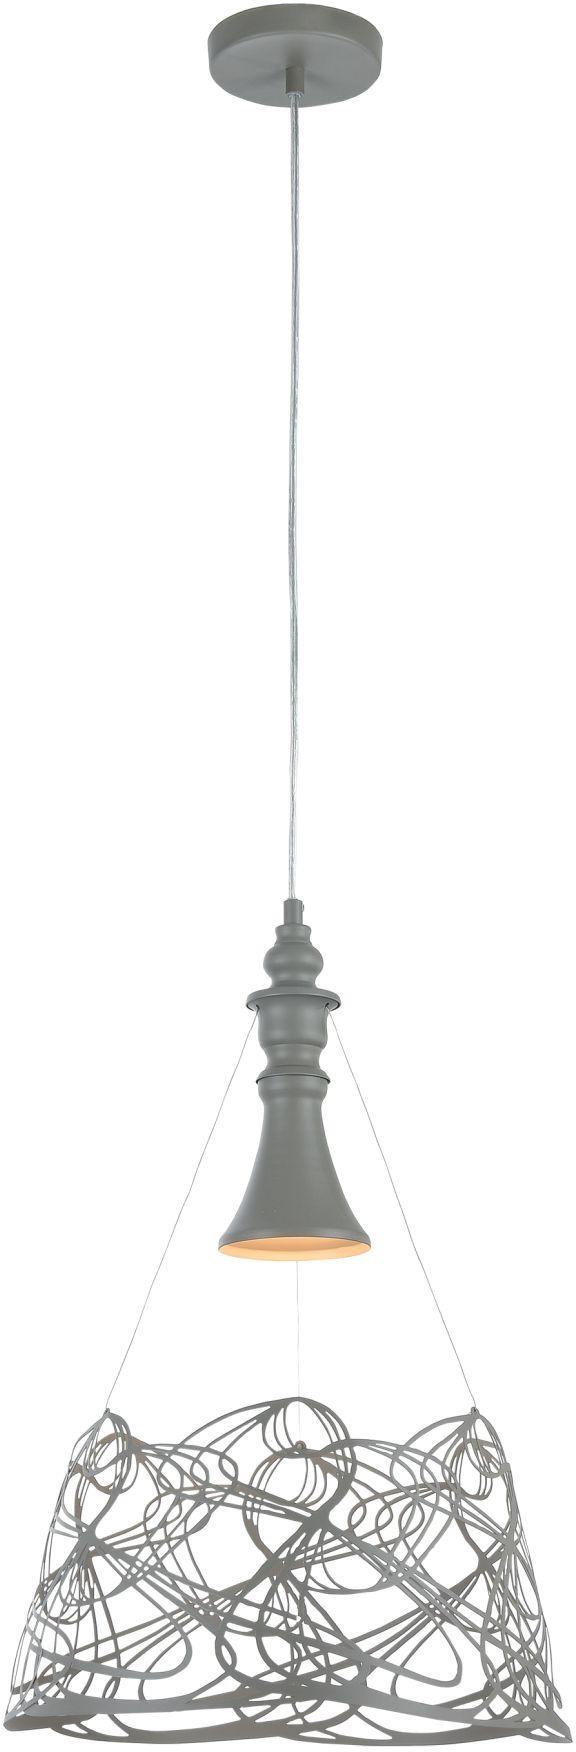 Maytoni Lampa wisząca ELVA P229-PL-01-GR -Maytoni P229-PL-01-GR